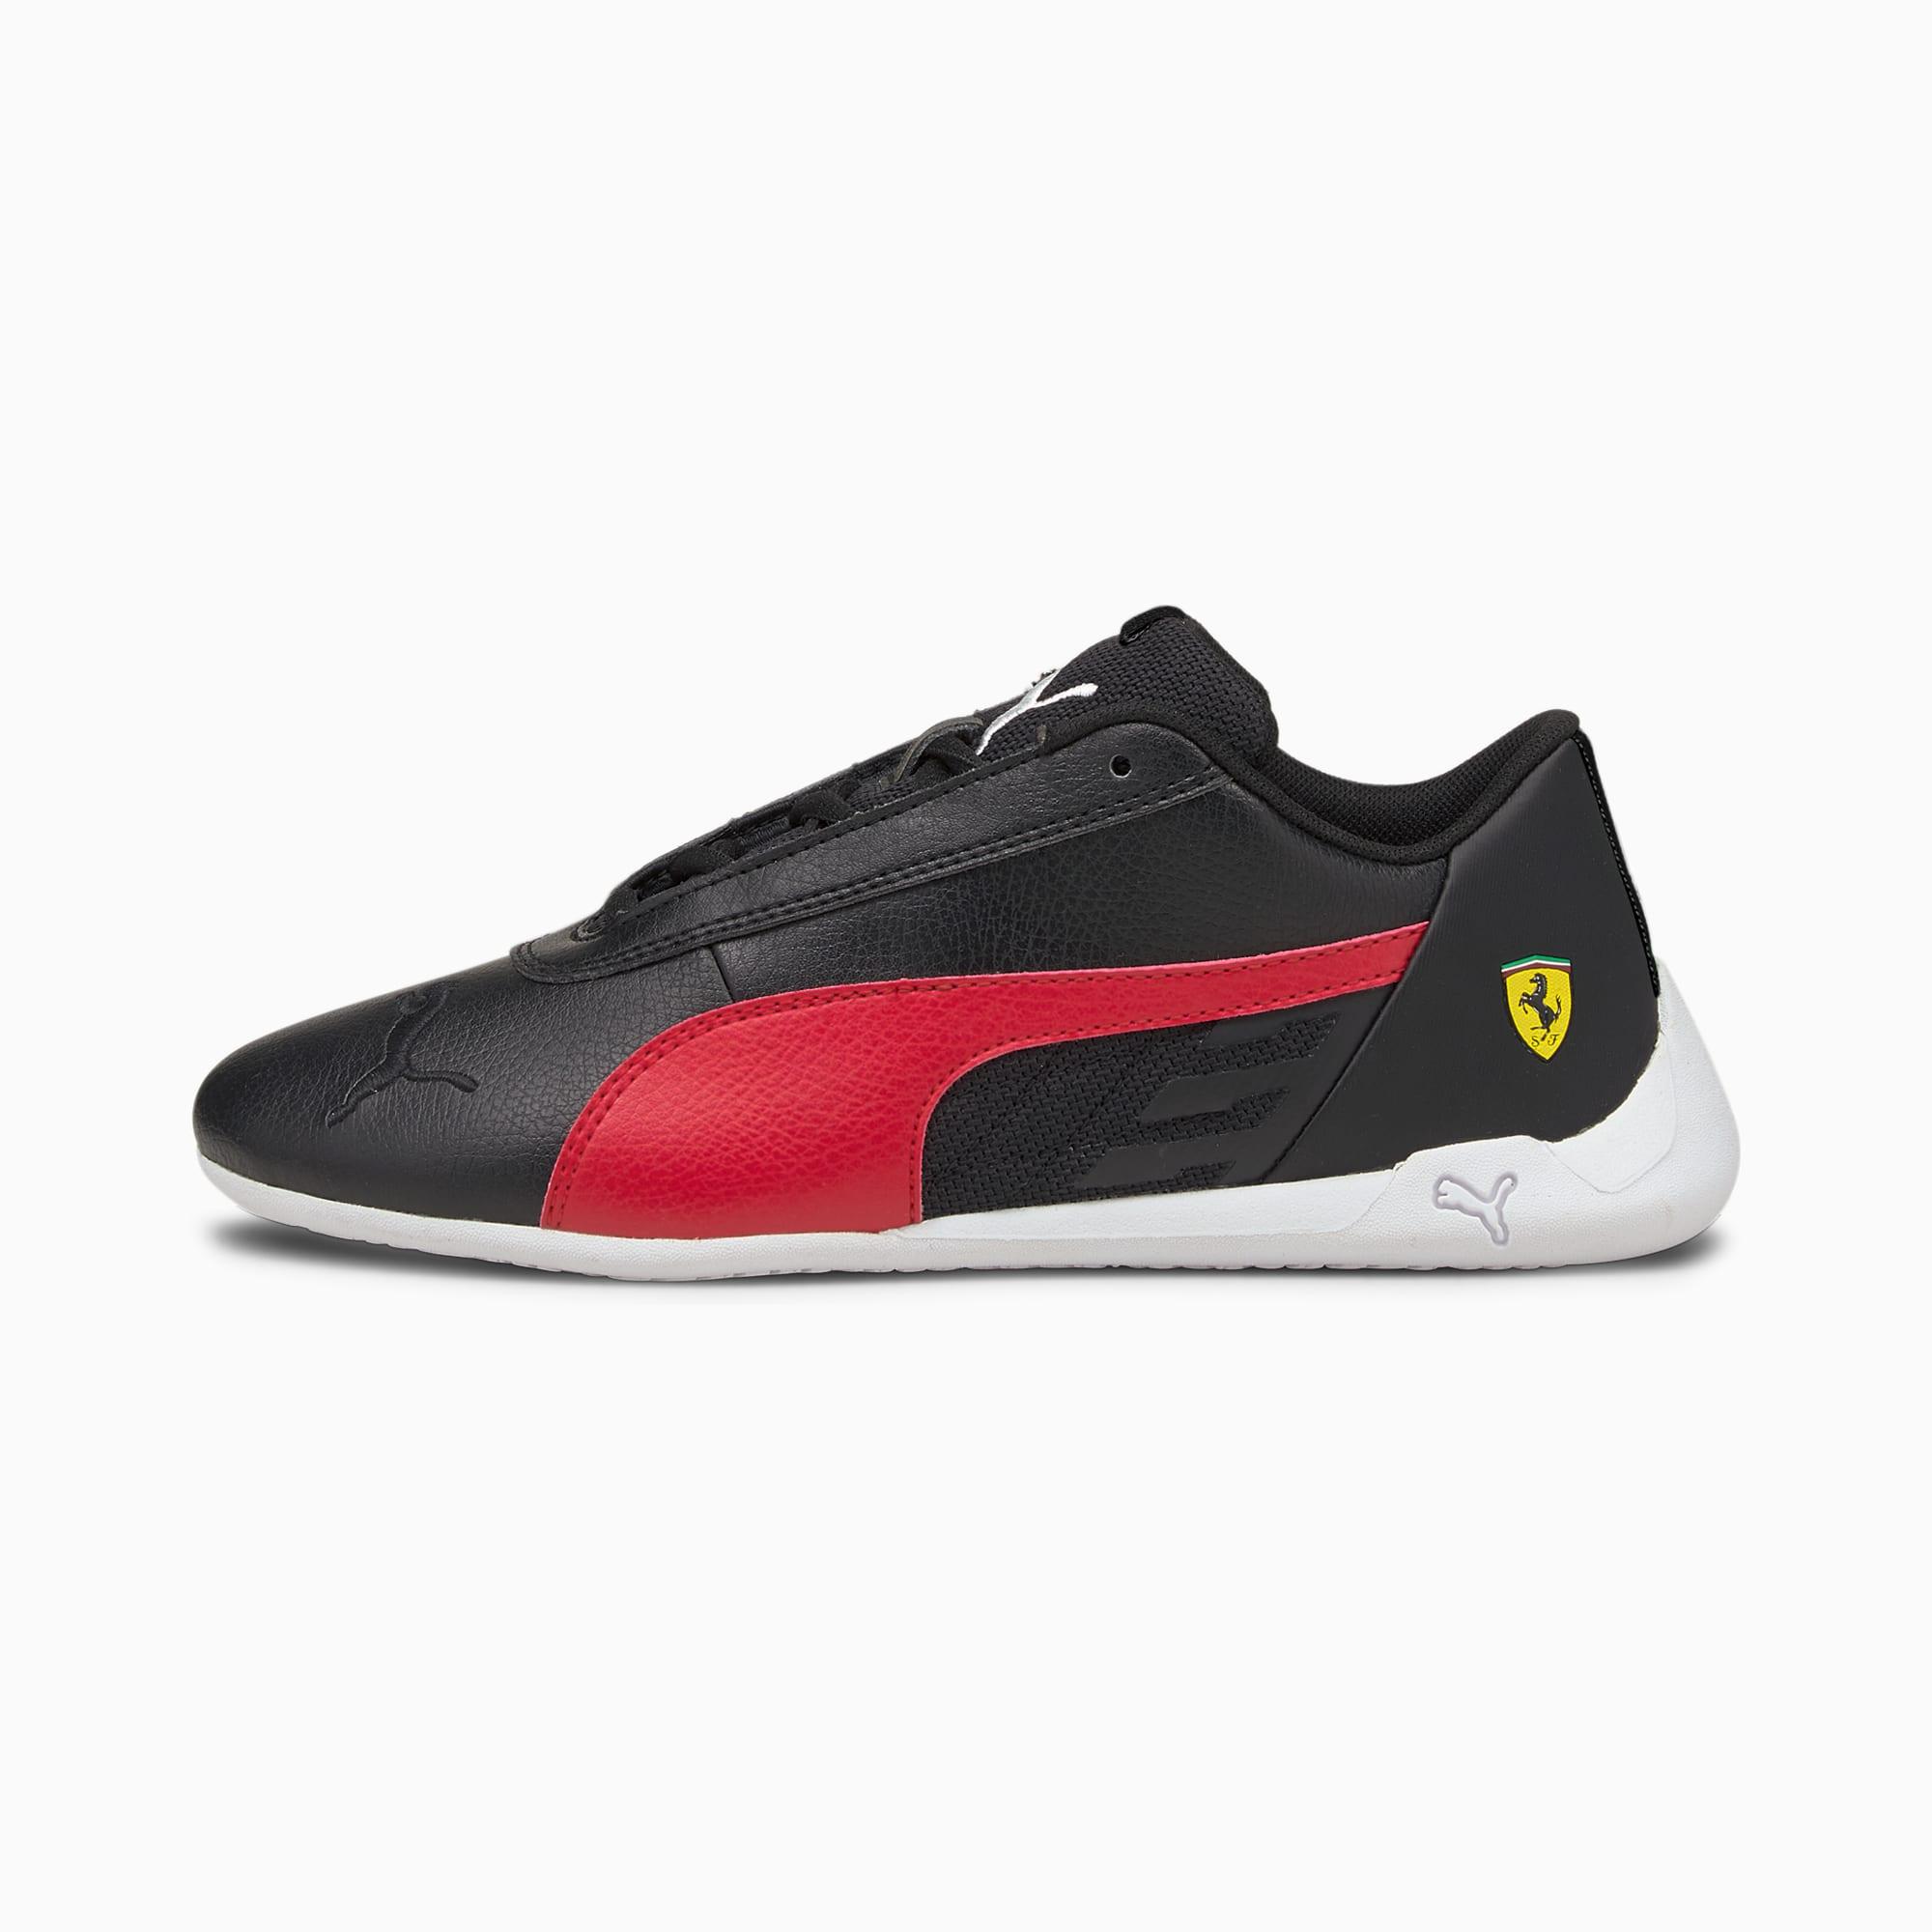 Scuderia Ferrari Race R-Cat Motorsport schoenen, Zwart/Rood/Wit, Maat 38 | PUMA